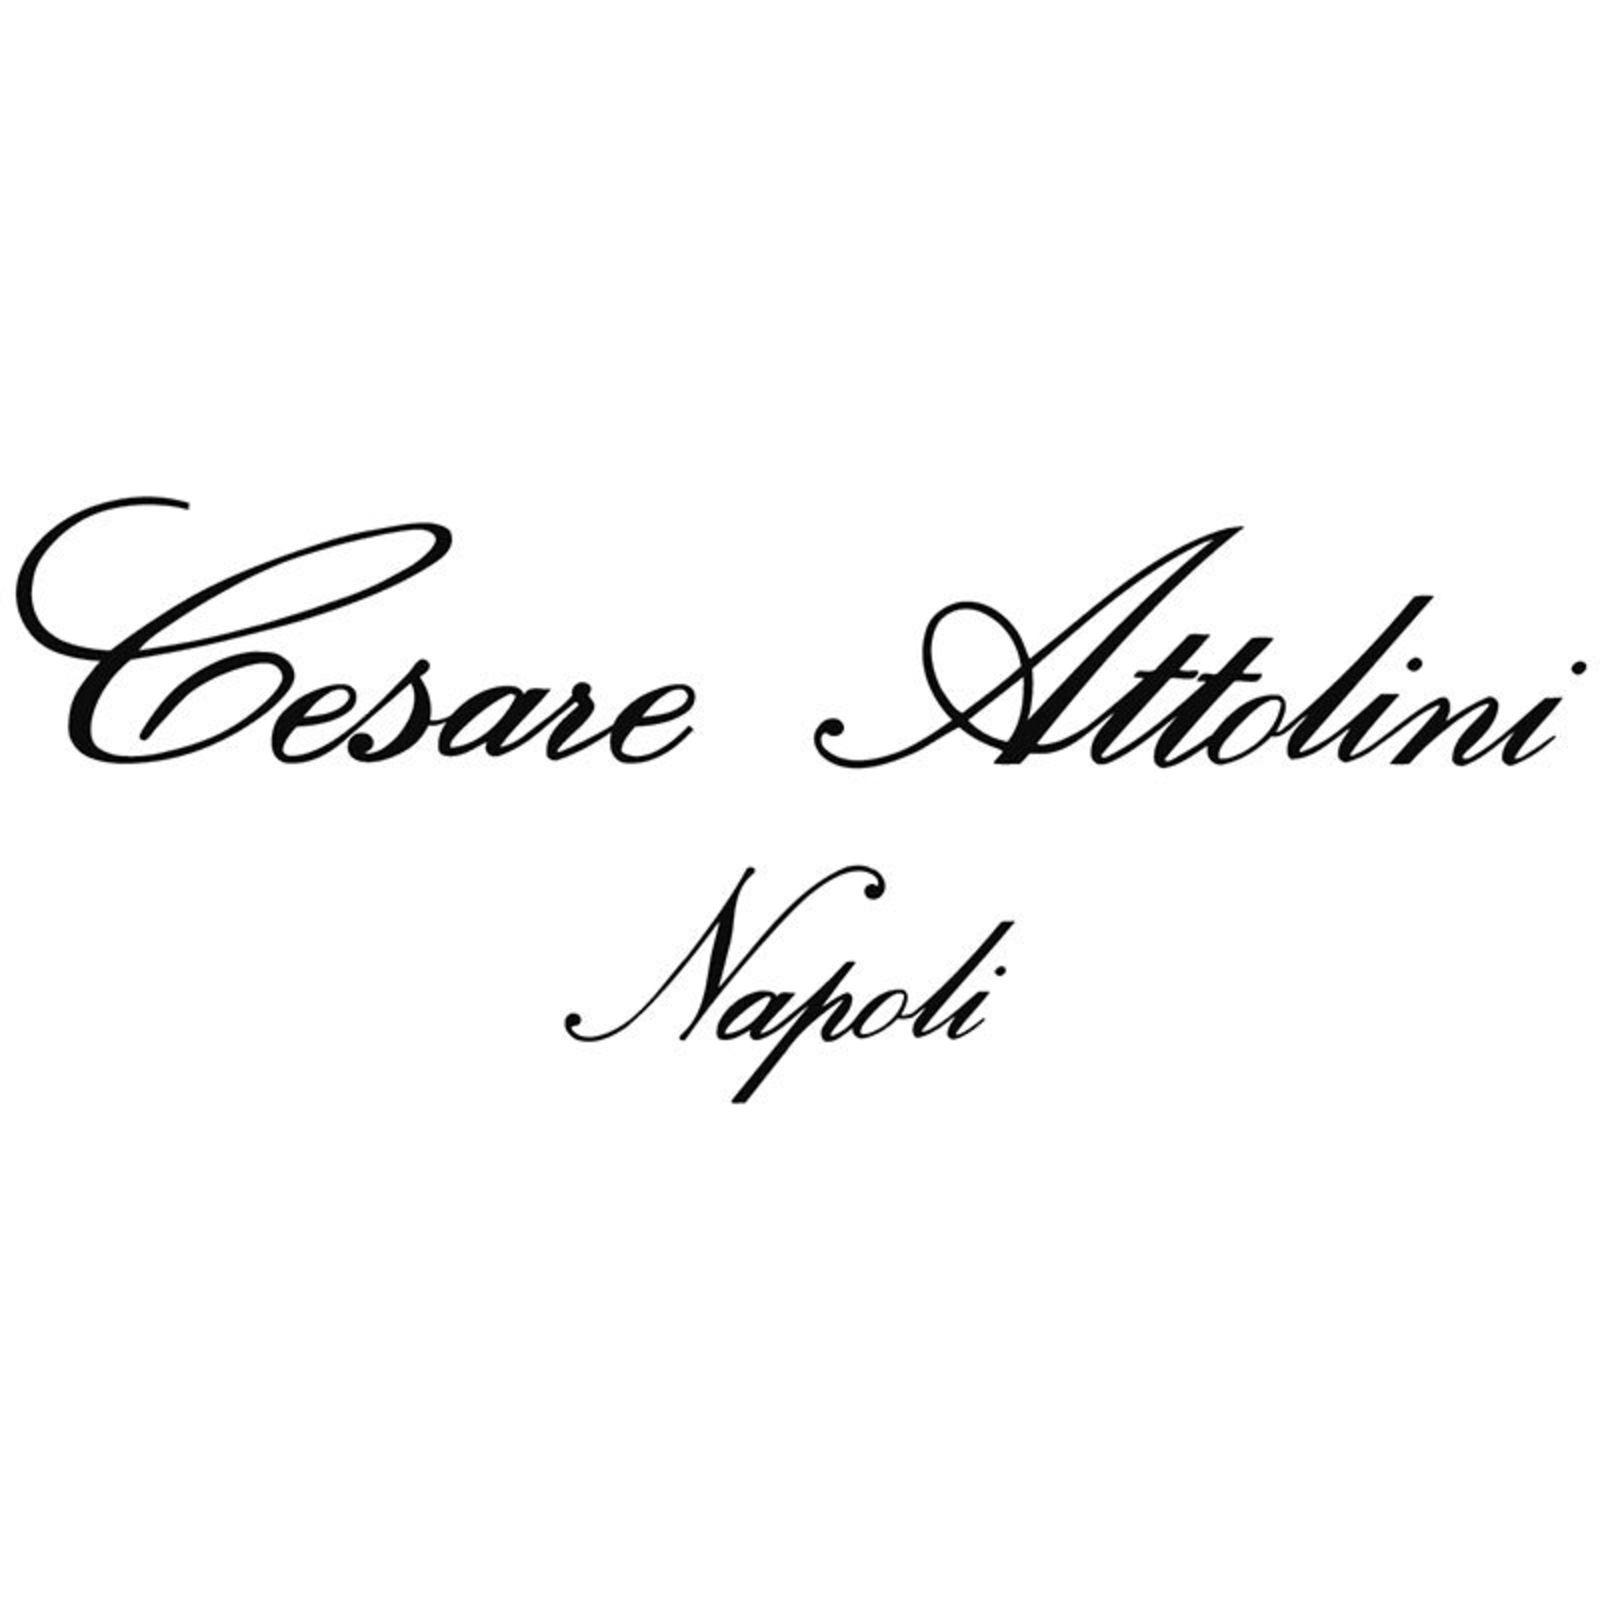 Cesare Attolini